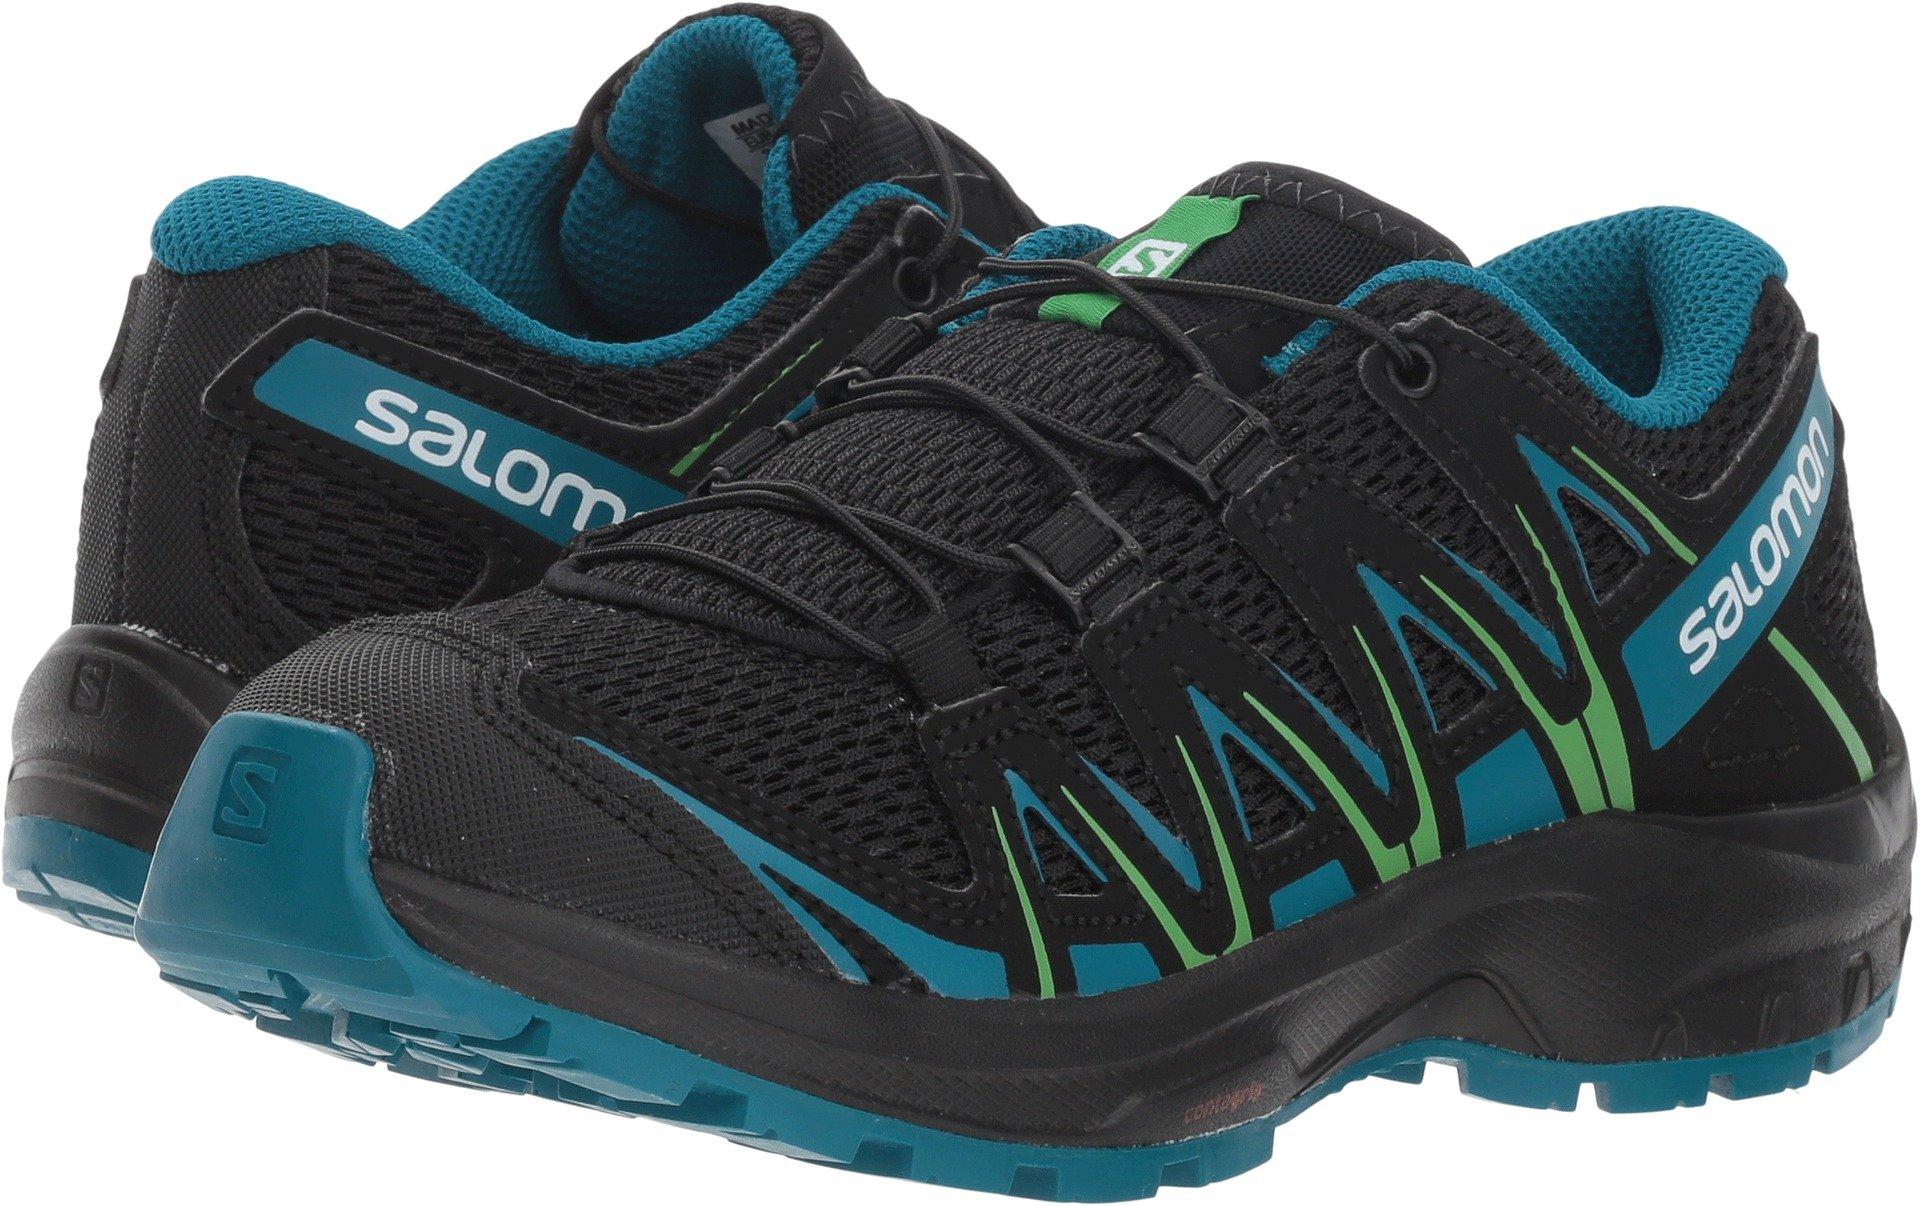 Salomon XA PRO 3D J Trail Running Shoe, Black/deep Lagoon/Onlime Lime, 5 Child US